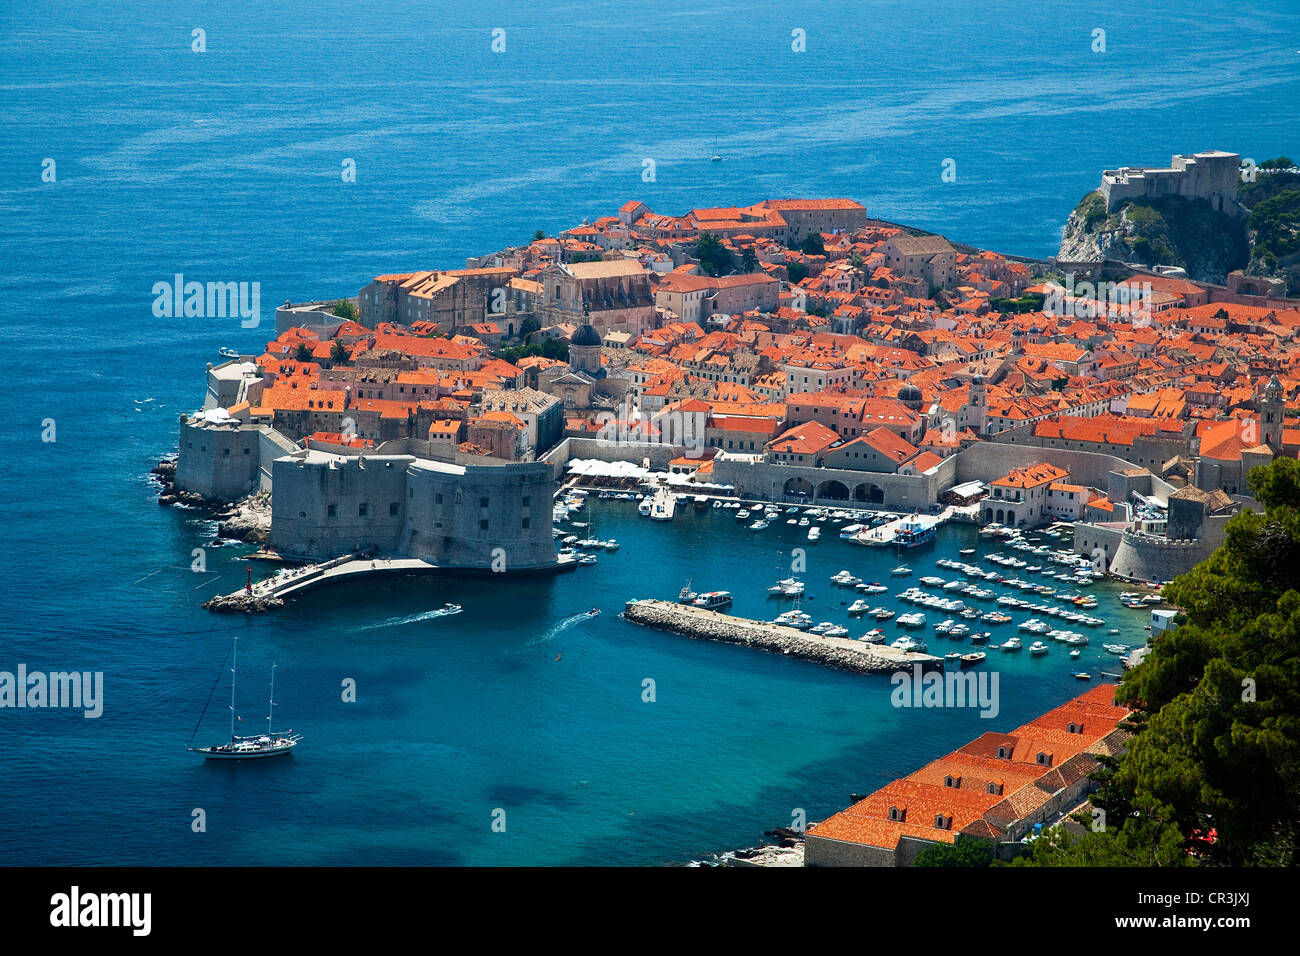 Croatia, Dalmatia, Dalmatian Coast, Dubrovnik, historical centre UNESCO World Heritage - Stock Image